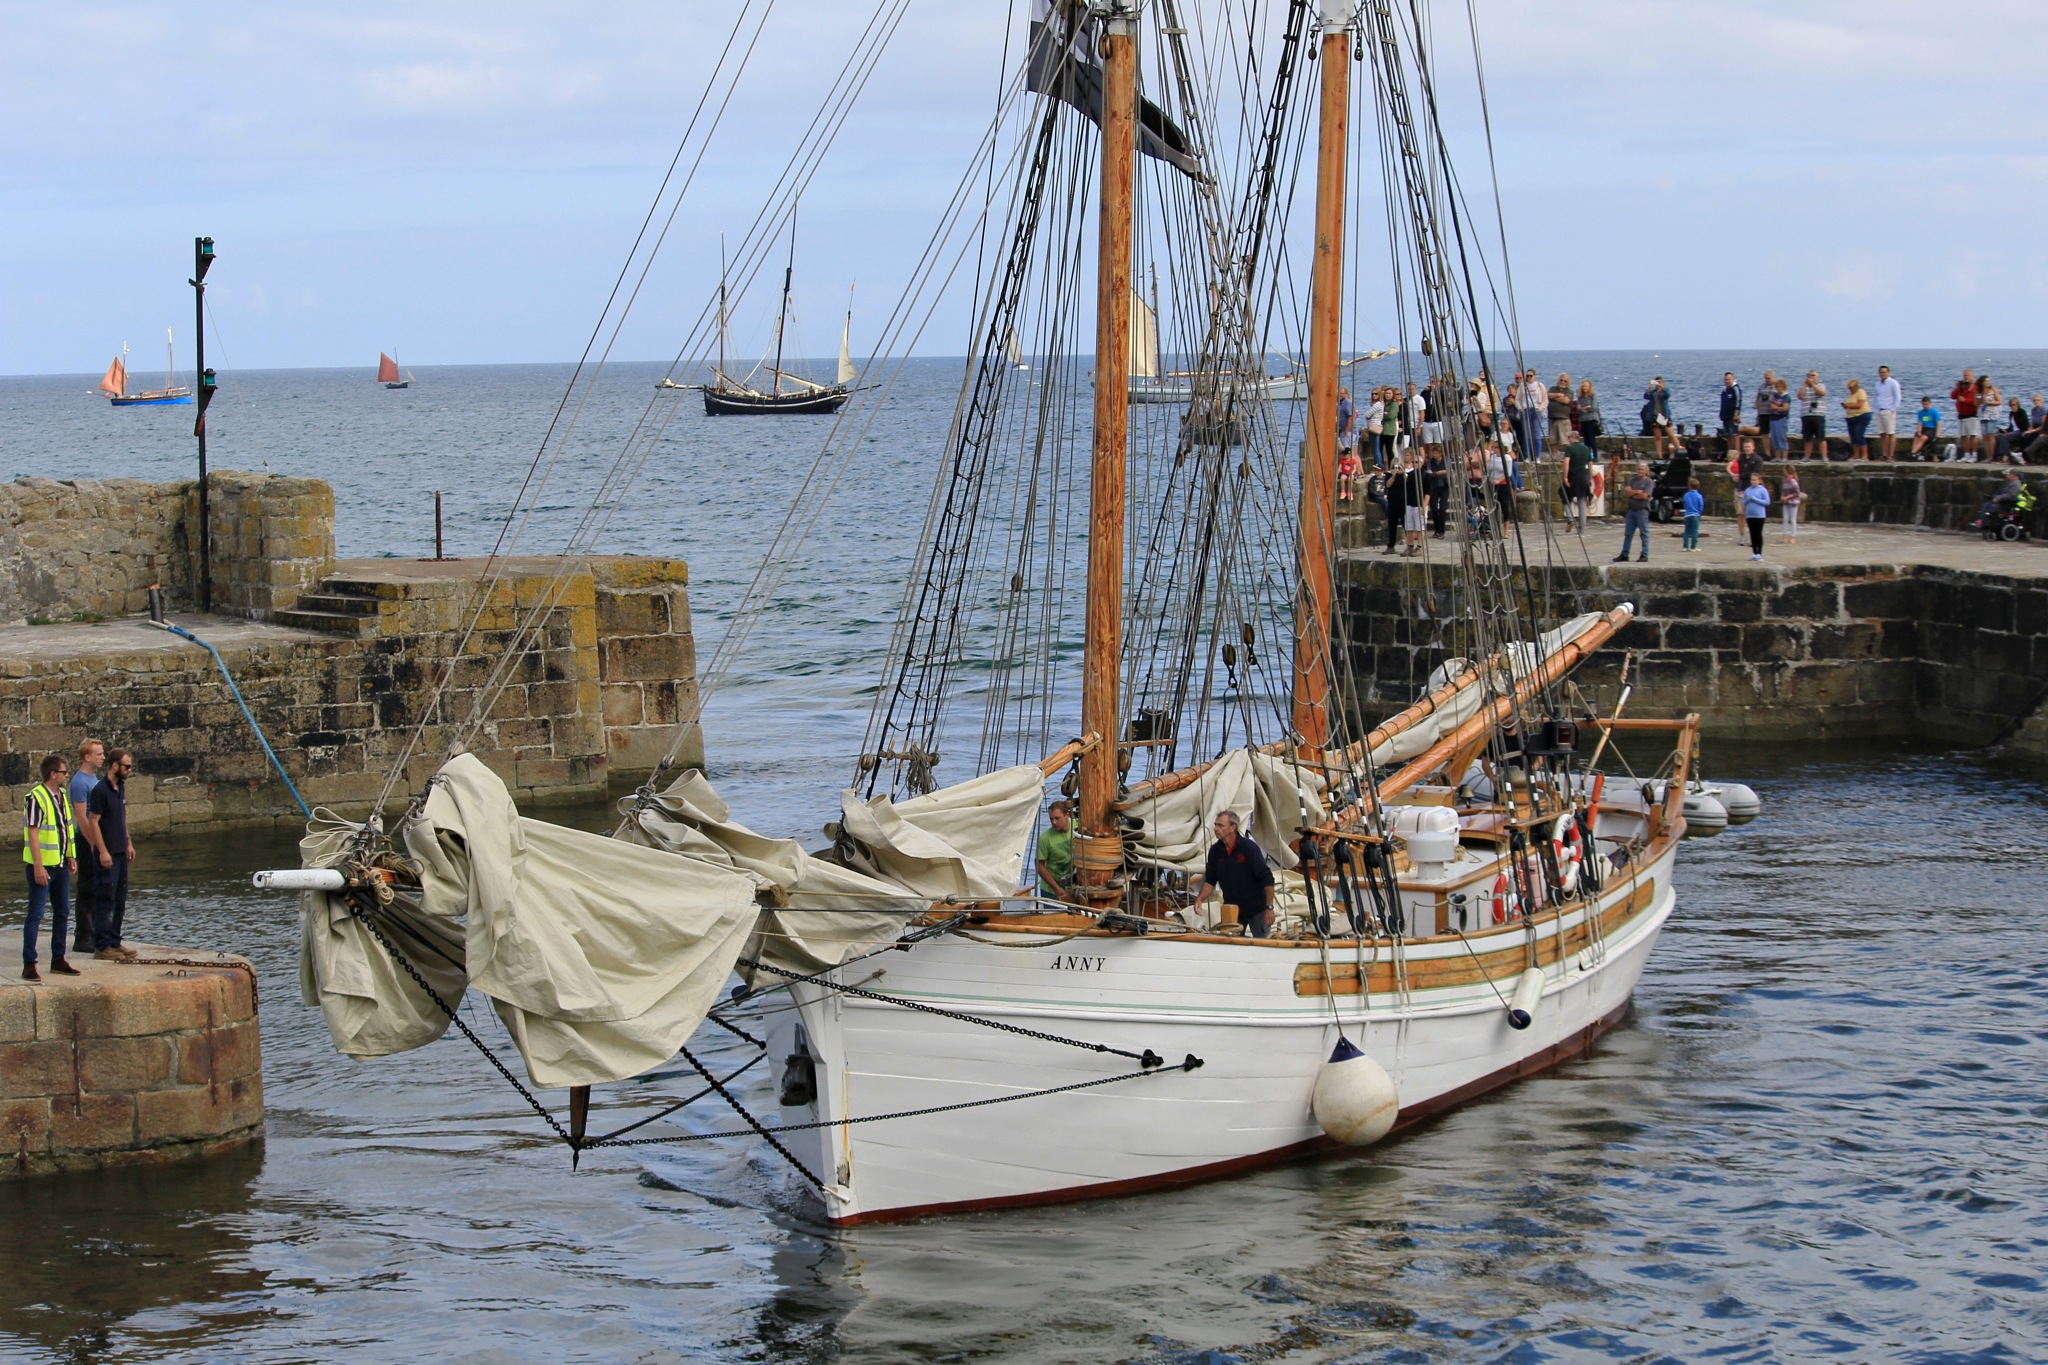 annie arriving at Charlestown by Paul Gast